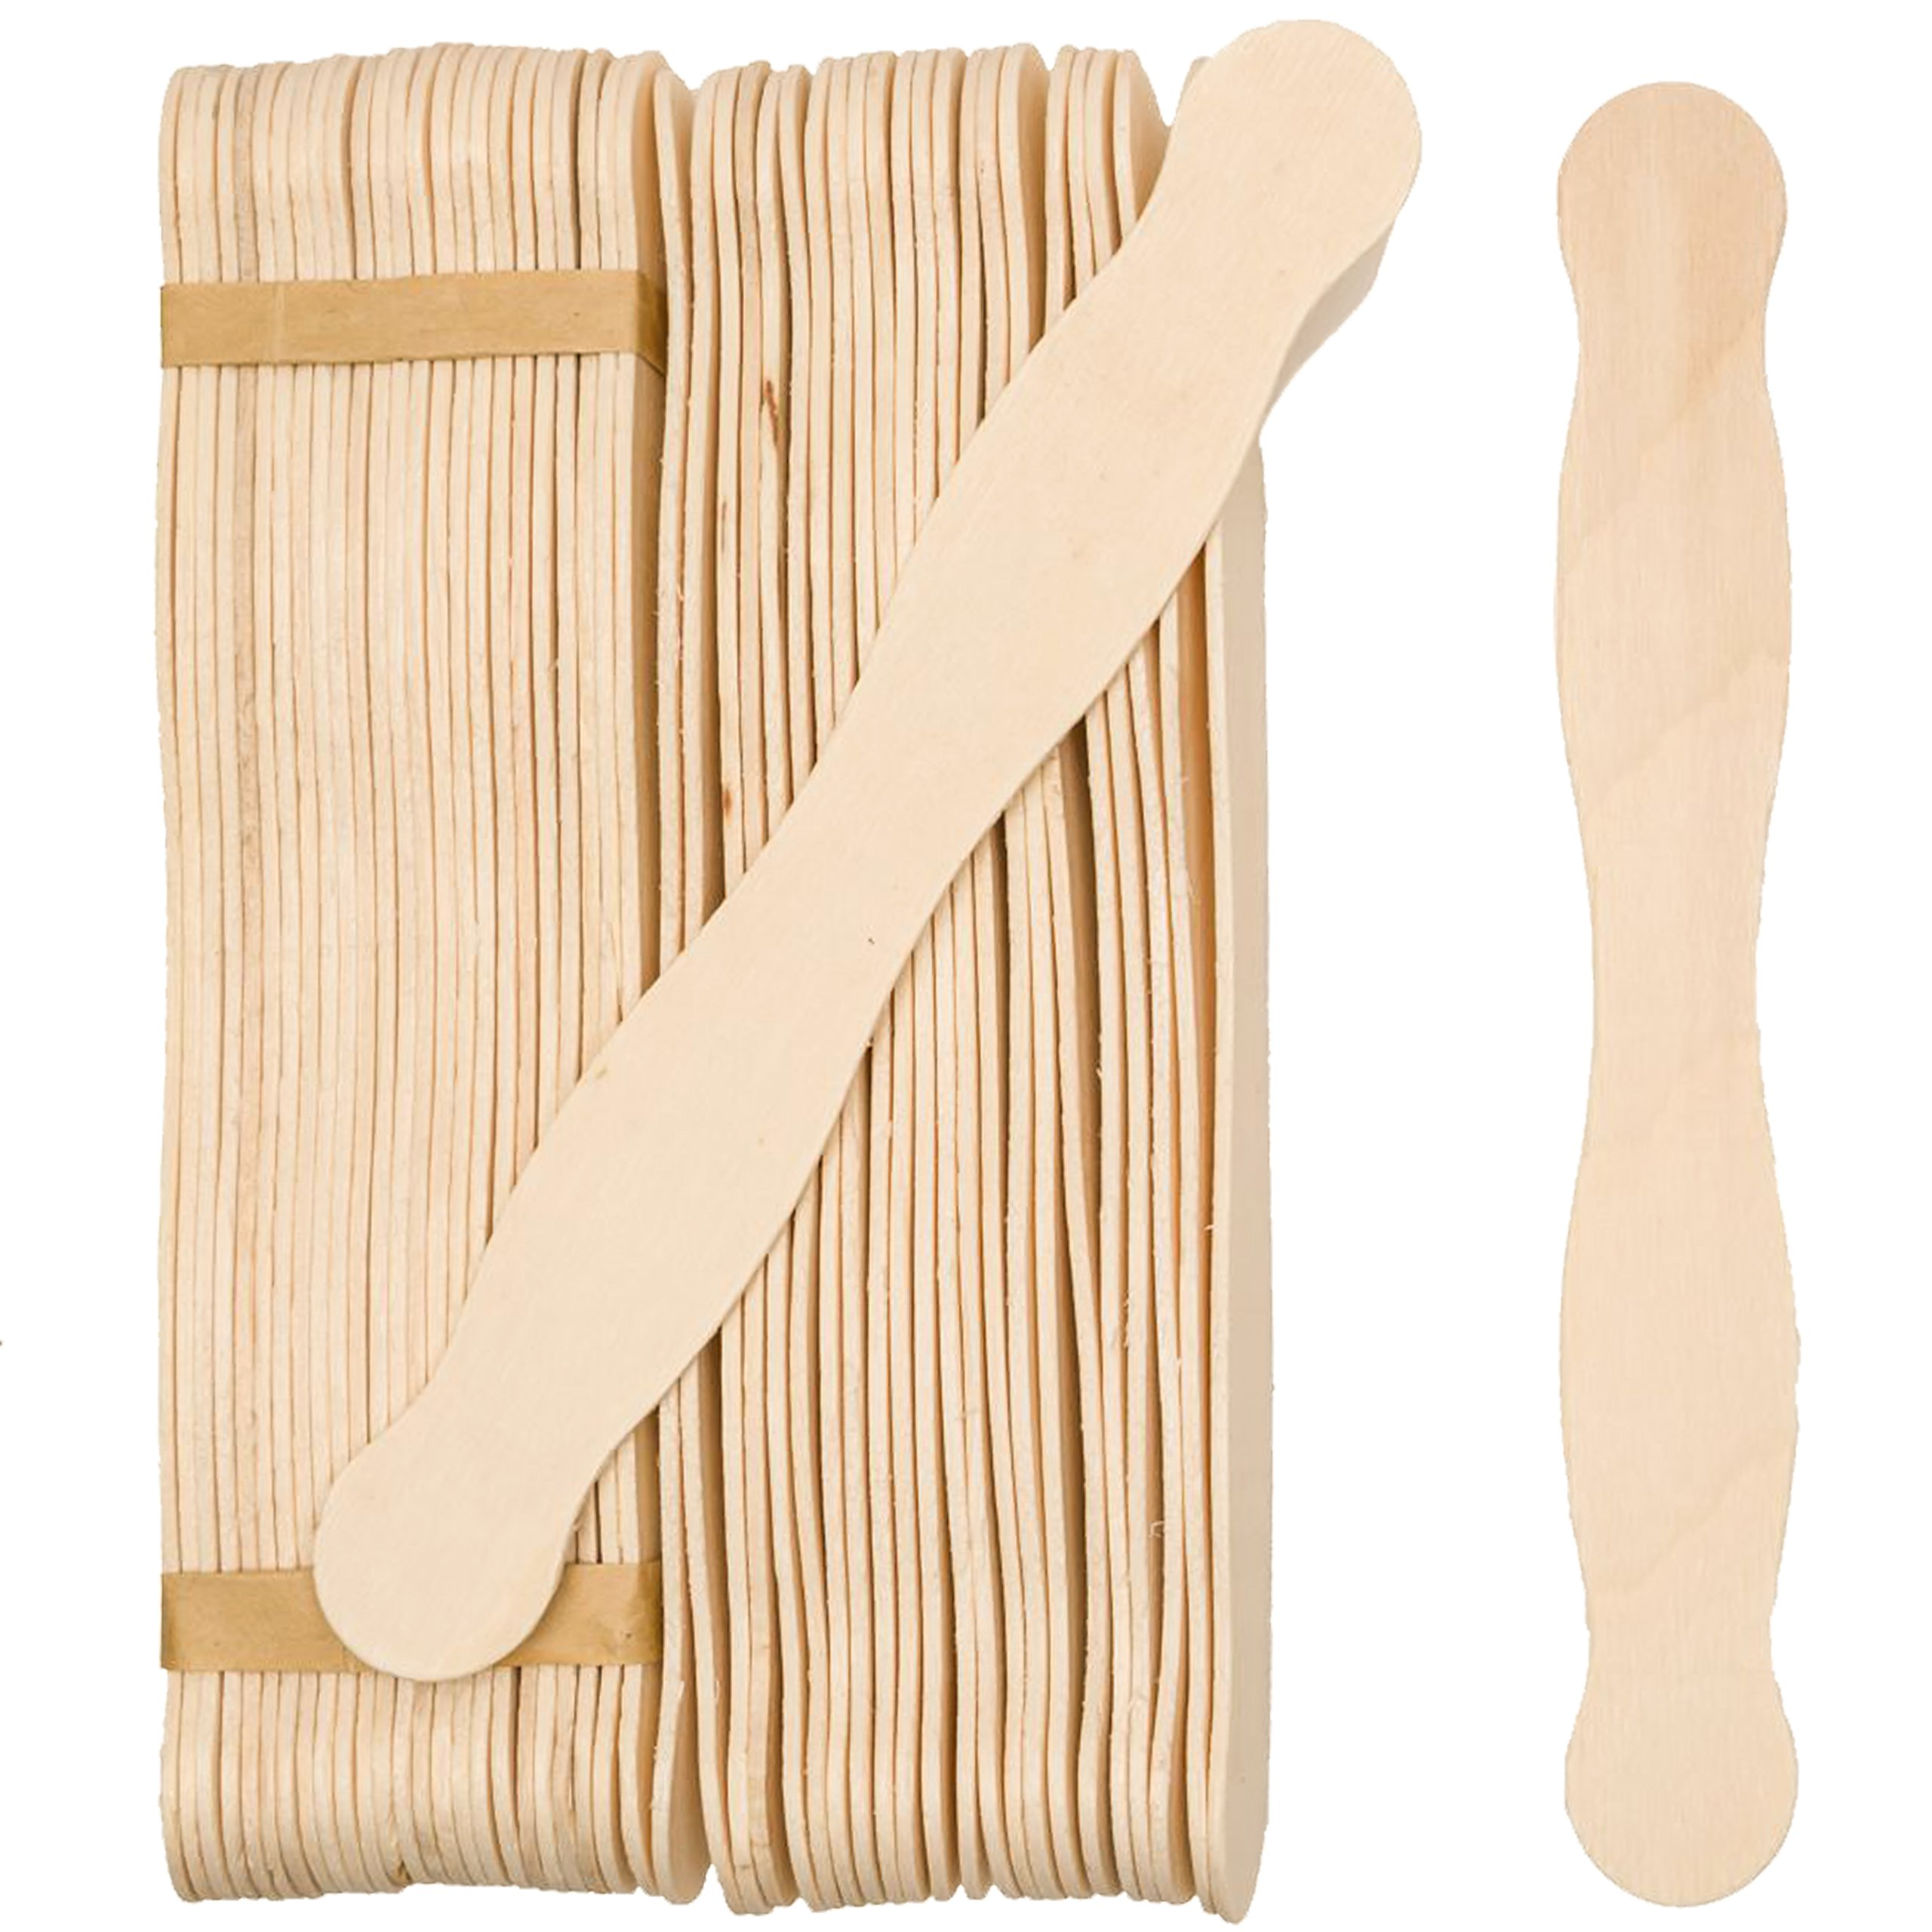 Woodpeckers 300 Natural Wavy Jumbo Wood Fan Handles Wedding Fan Craft Sticks